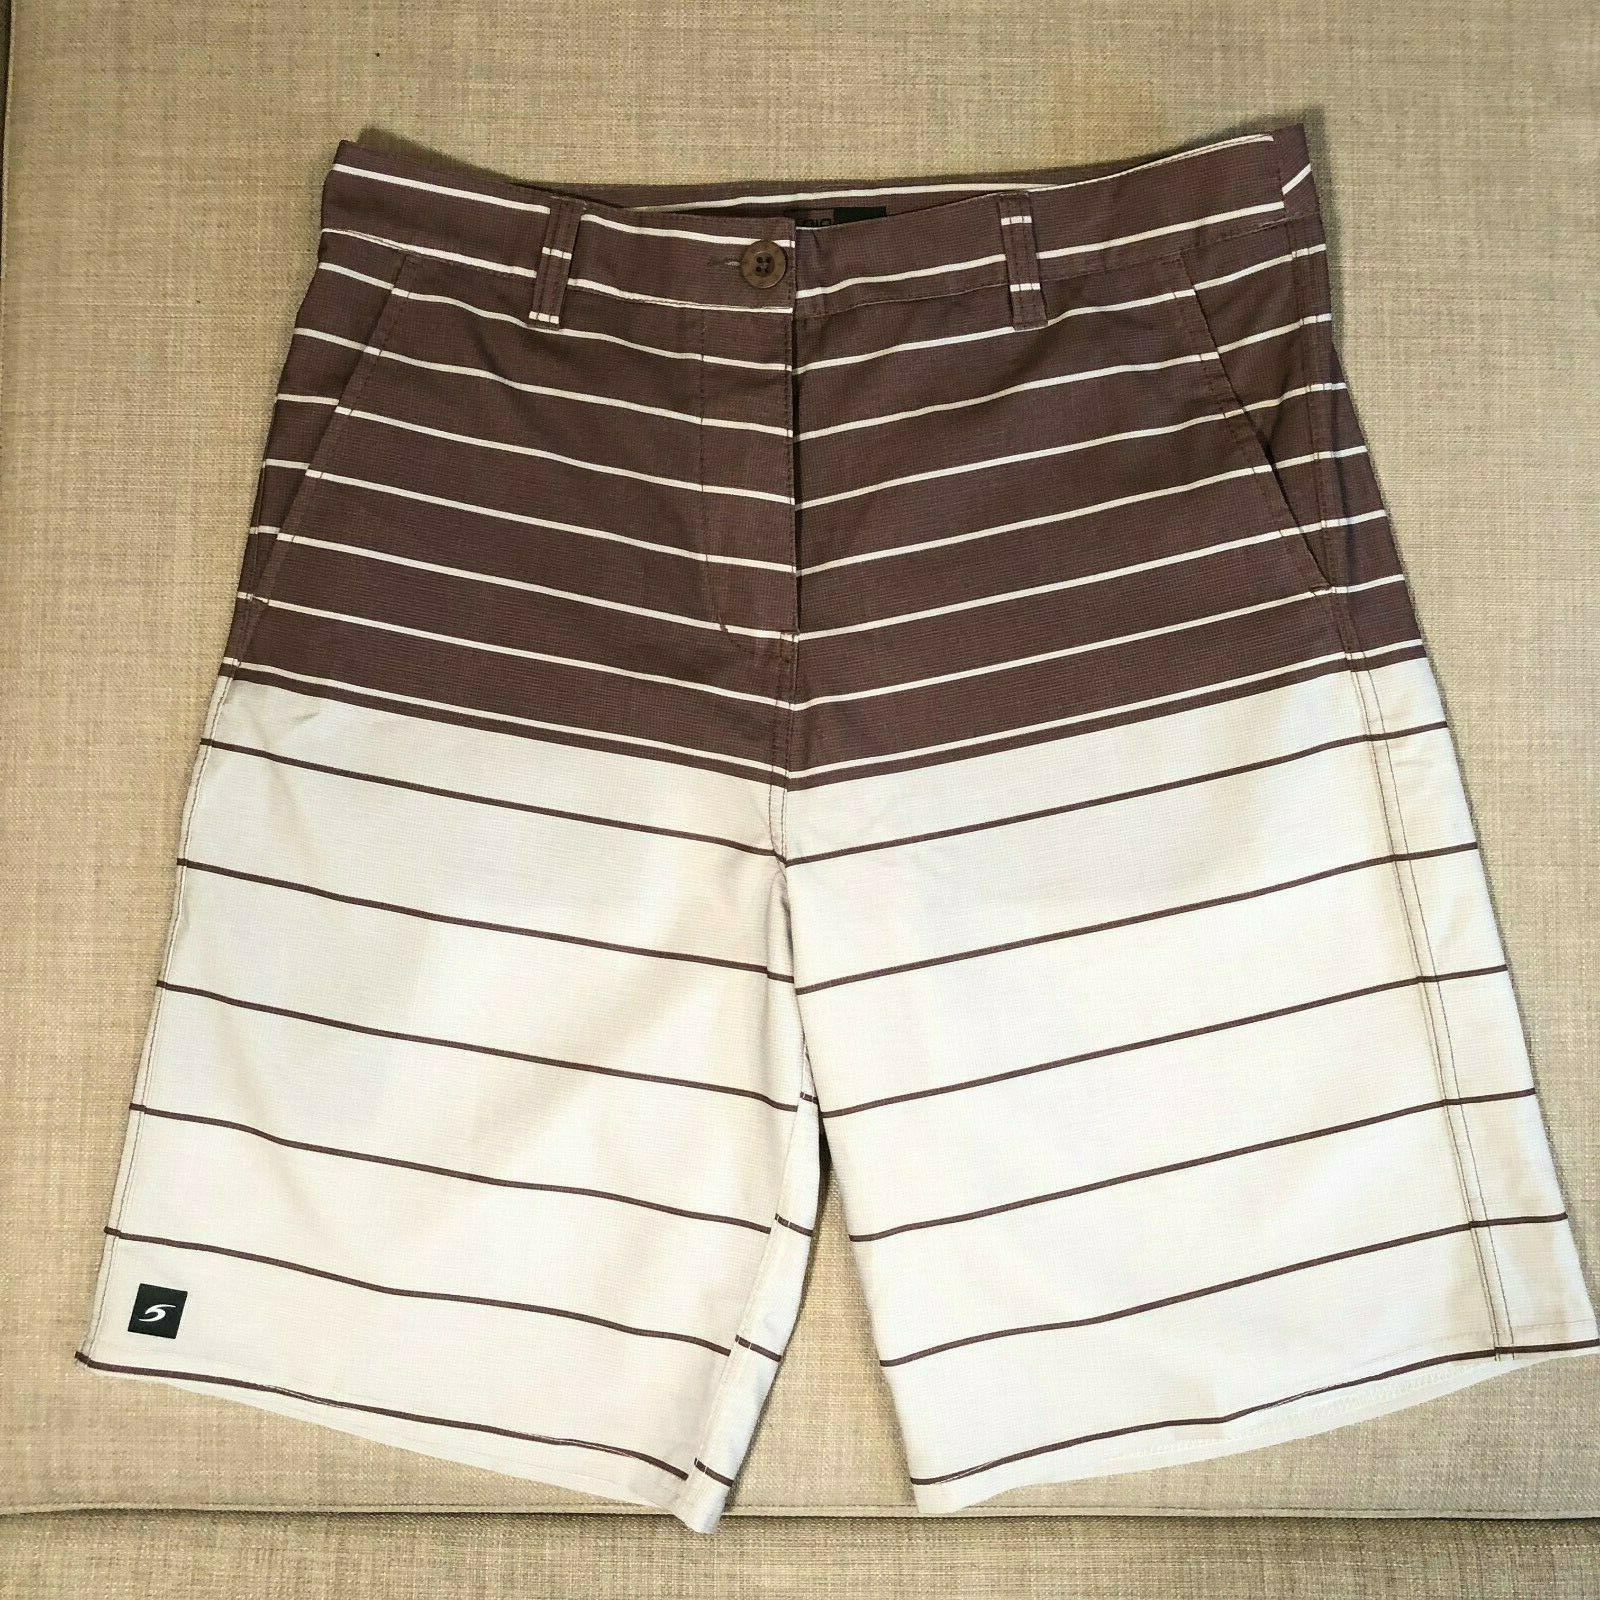 mirage boardwalk hybrid shorts boardshorts tan